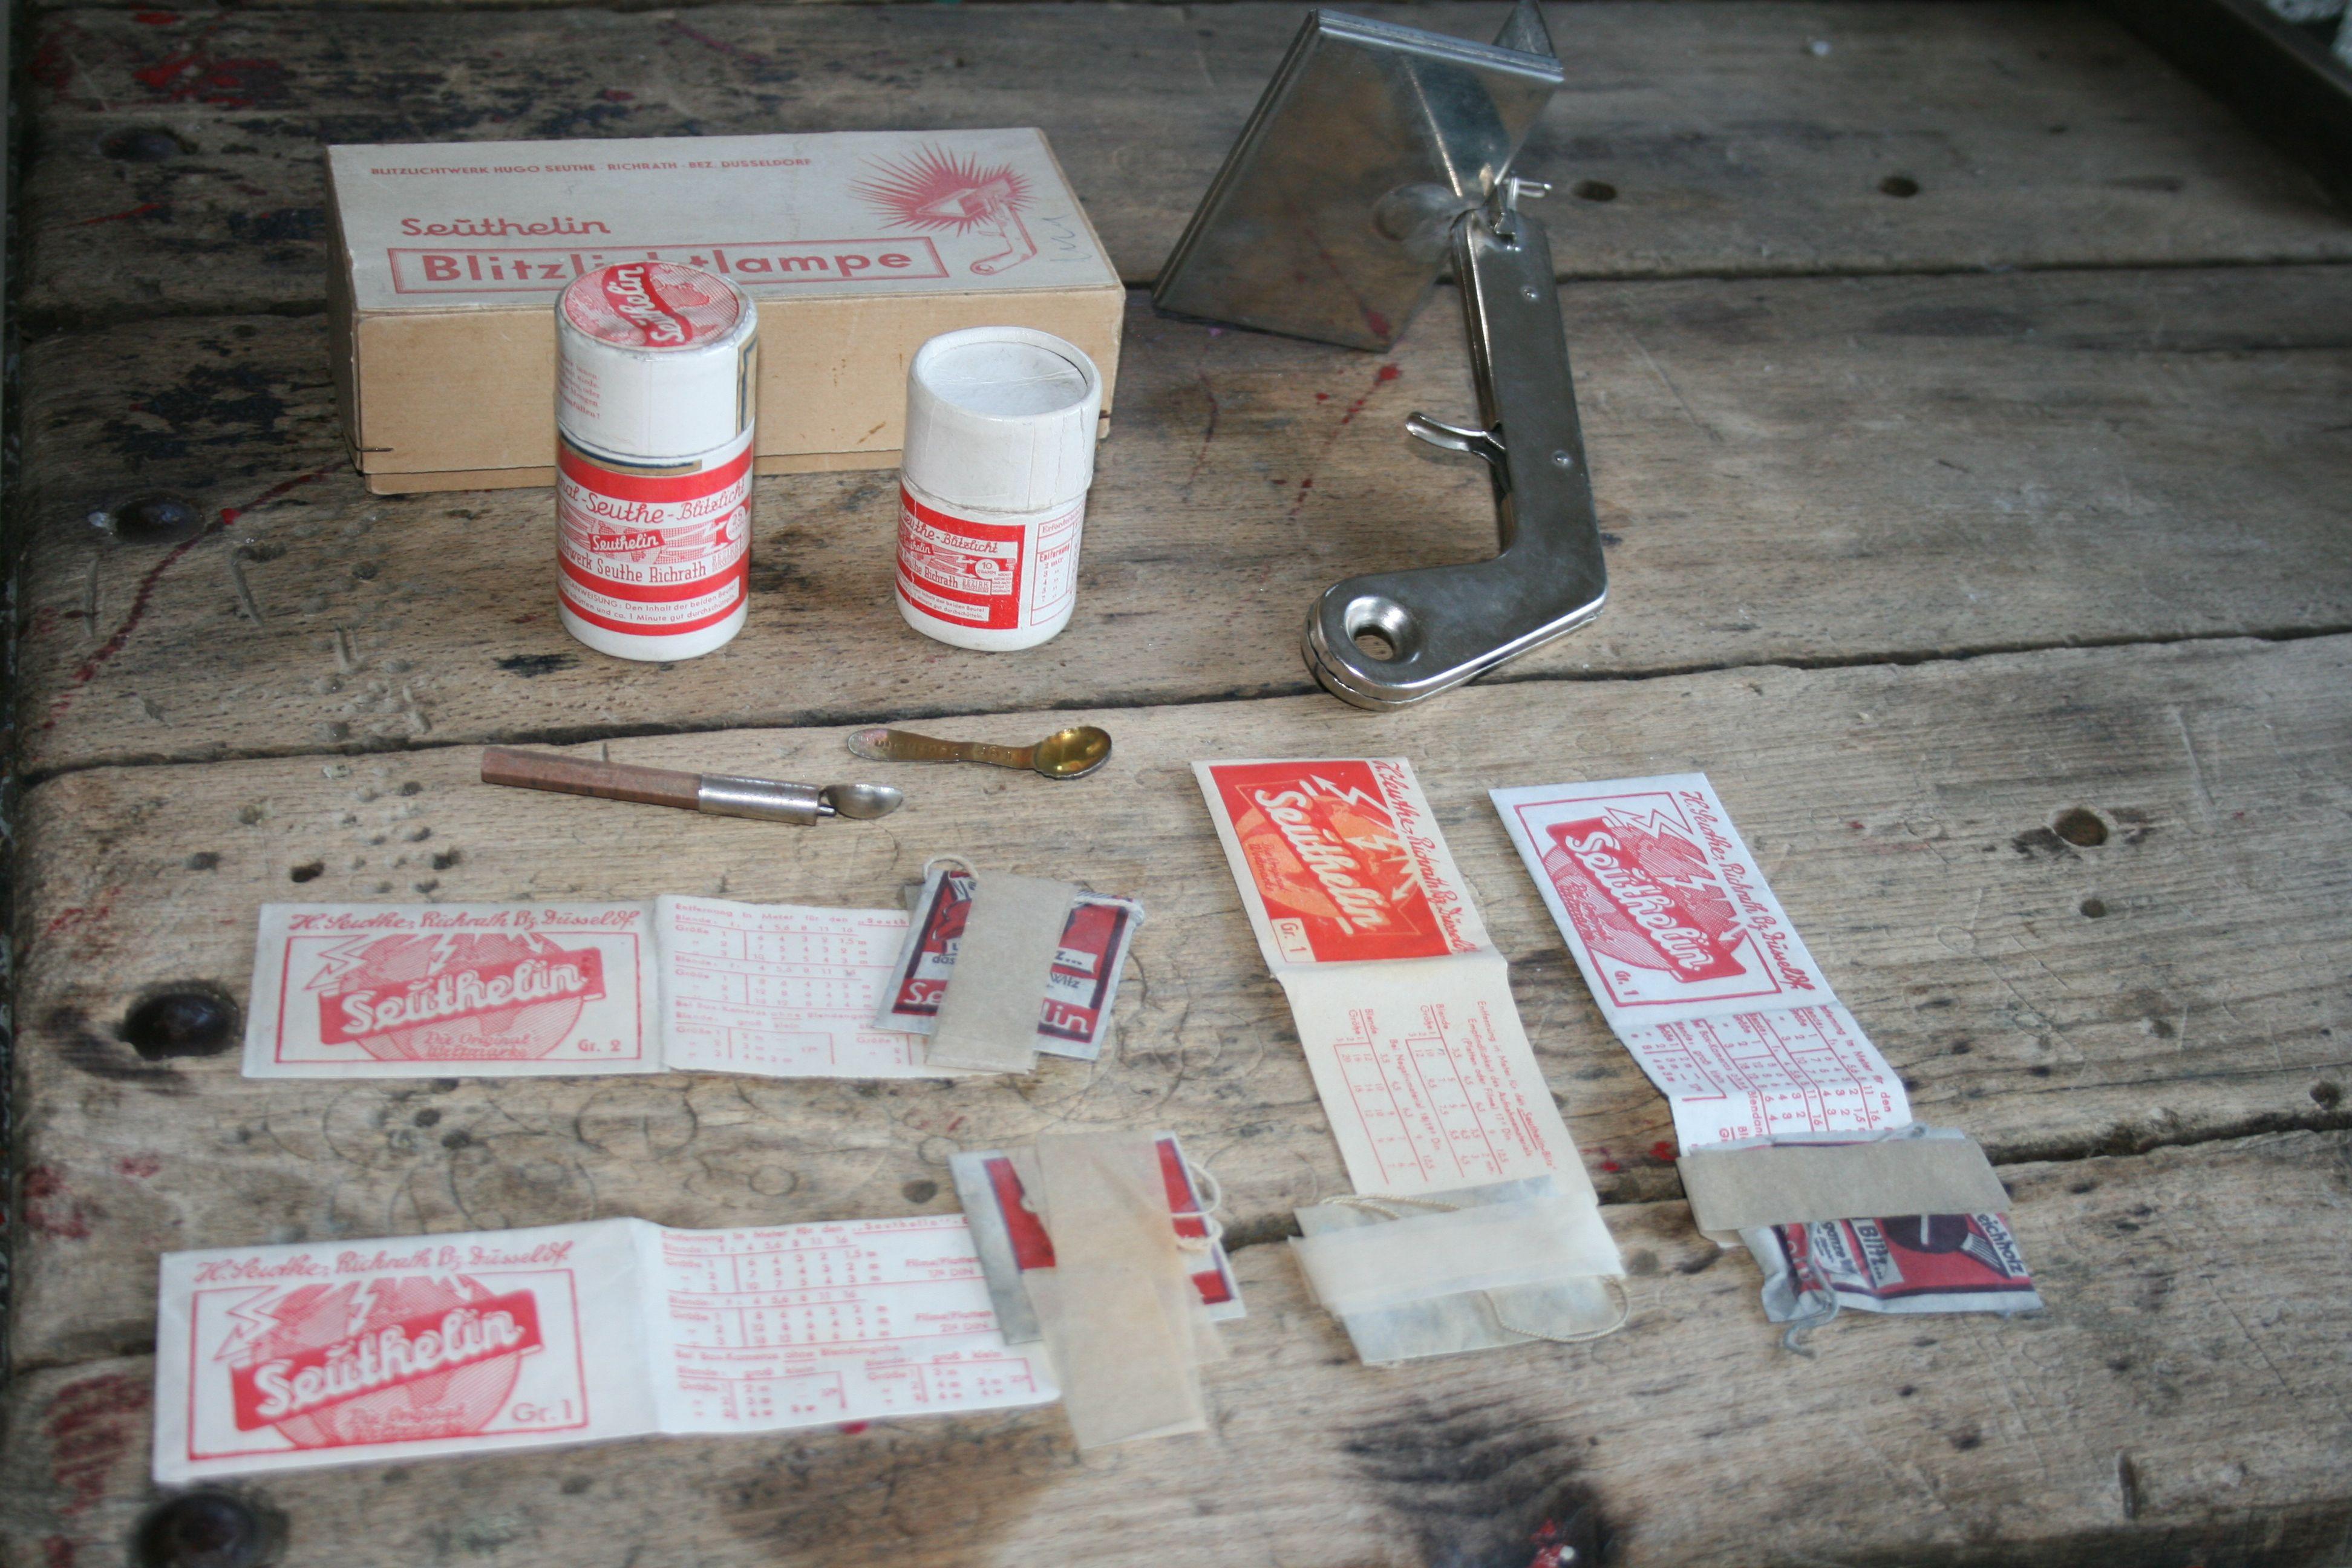 #Seuthelin #Blitz equipment with #Blitzpistole, blitz #pulver in box, #Blitzlichtbeutels,...